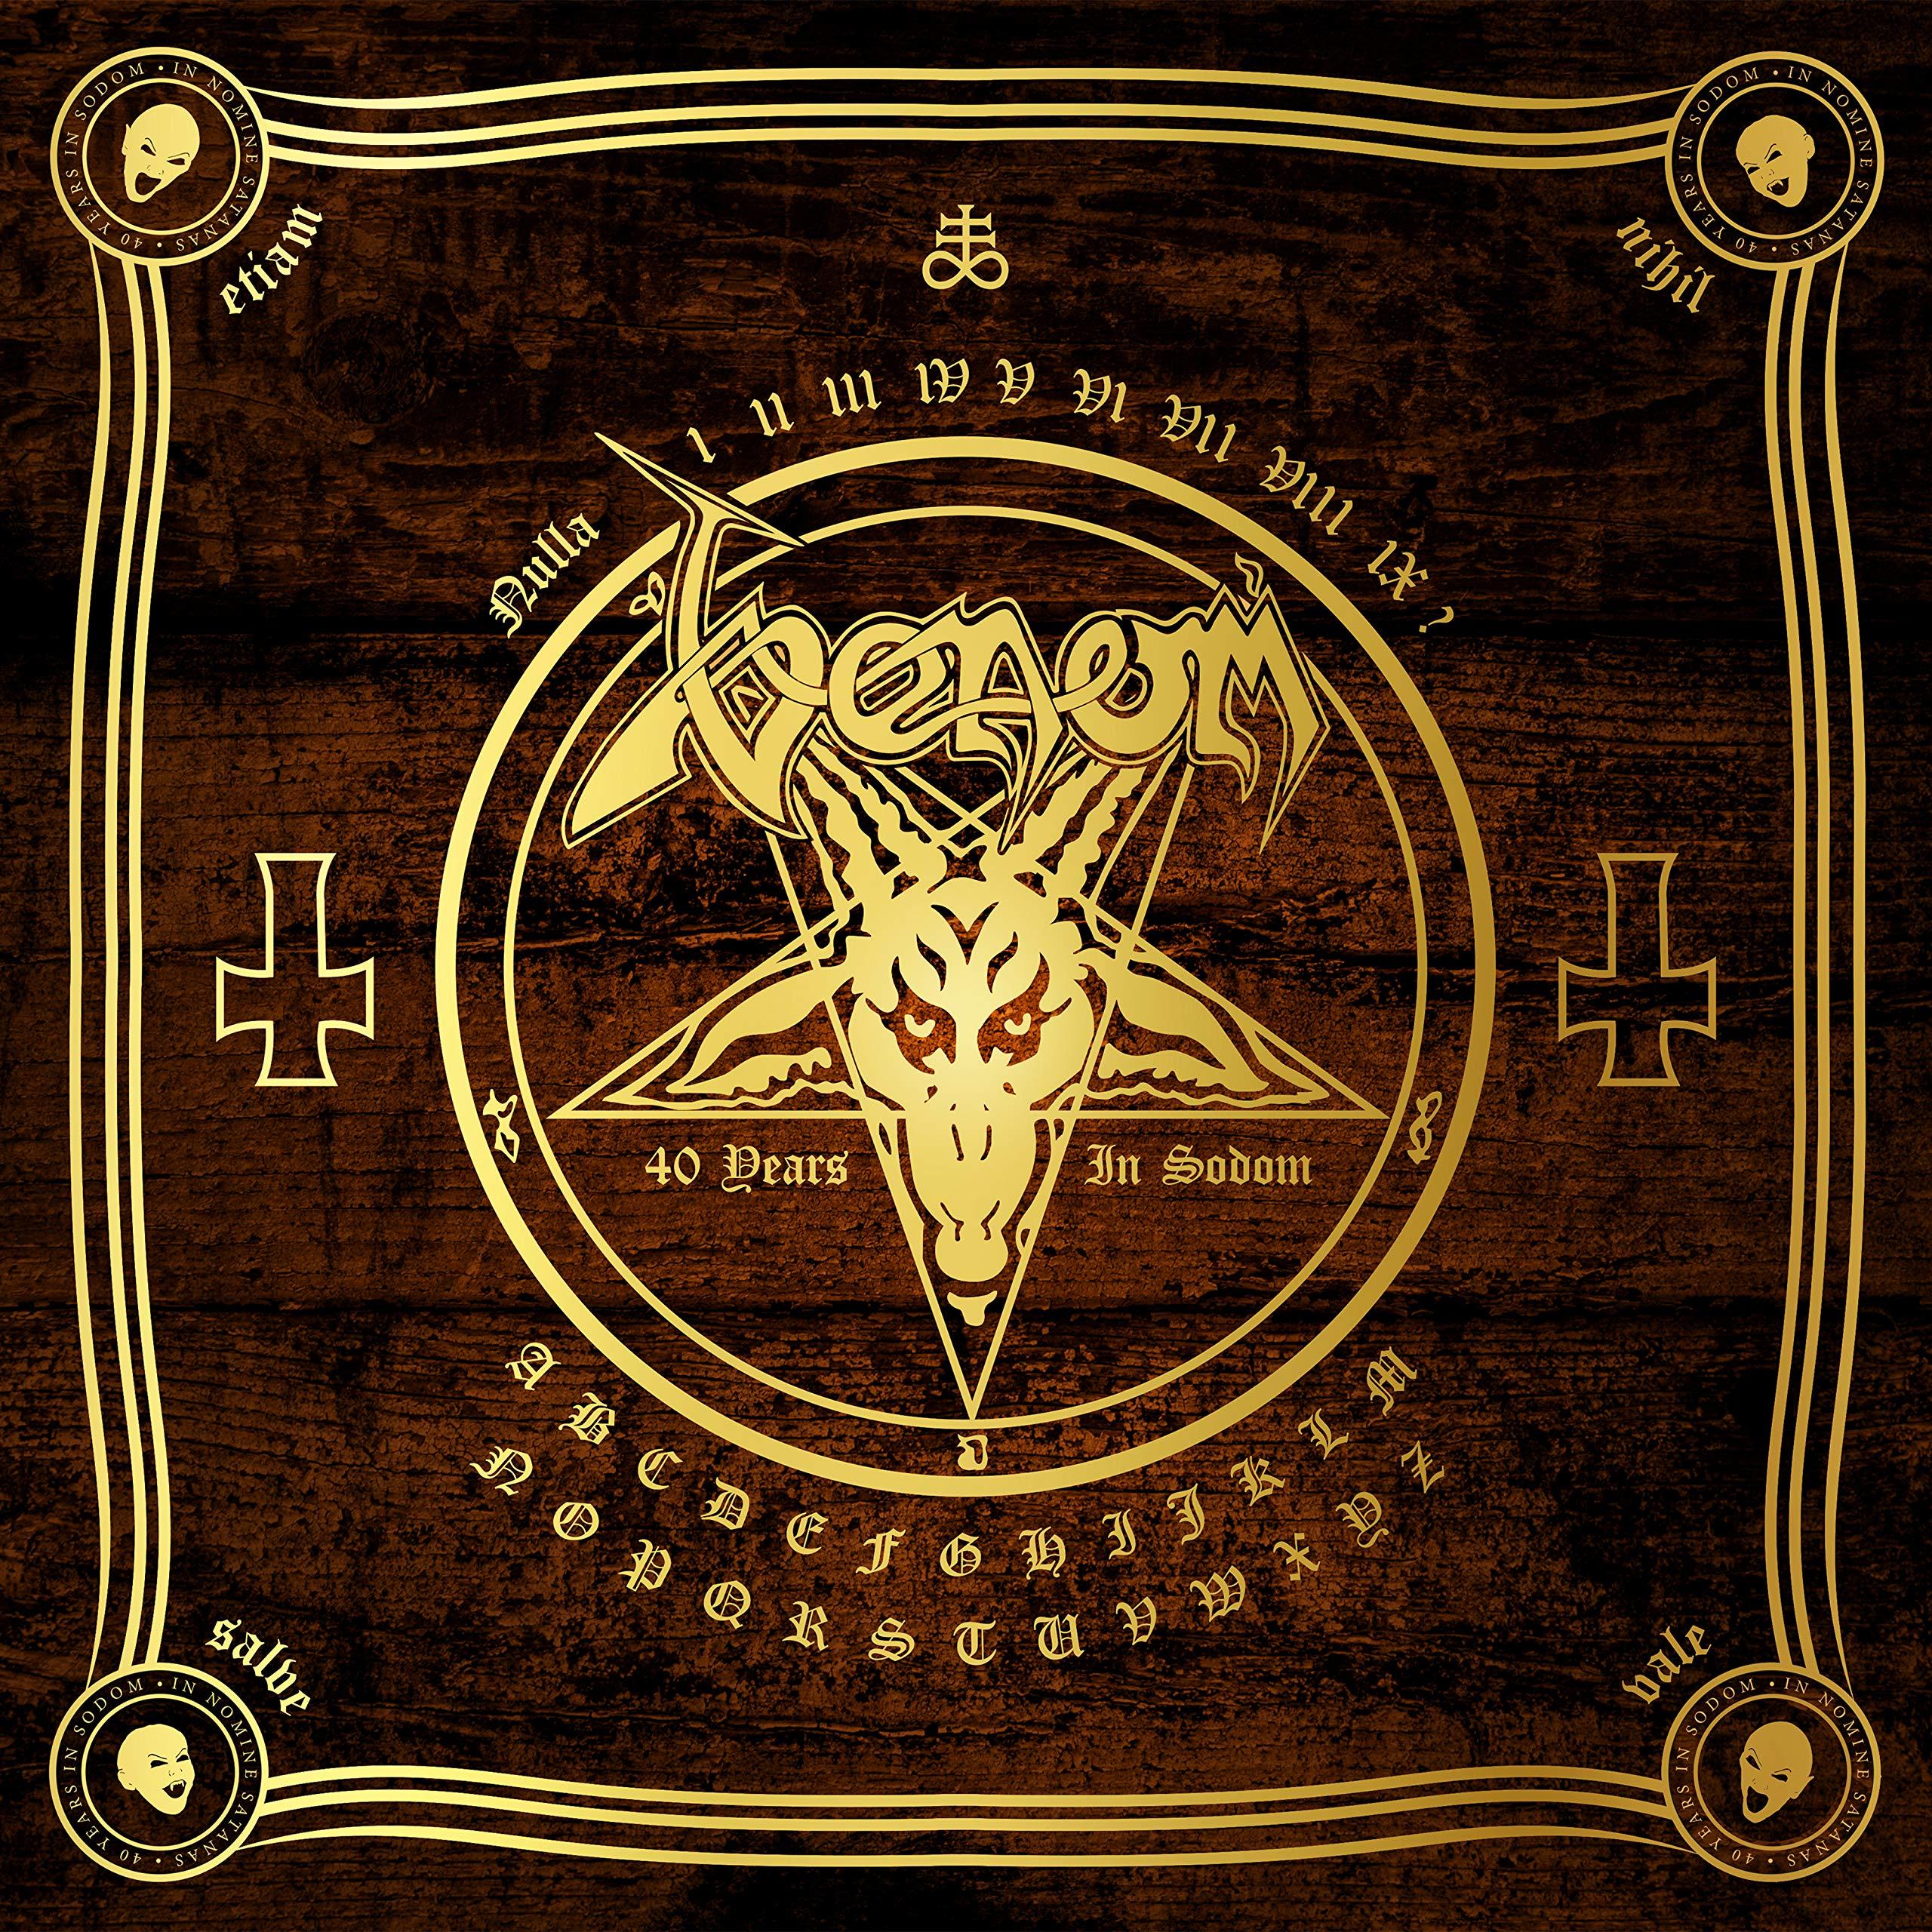 In Nomine Satanas by BMG RIGHTS MANAGEMEN